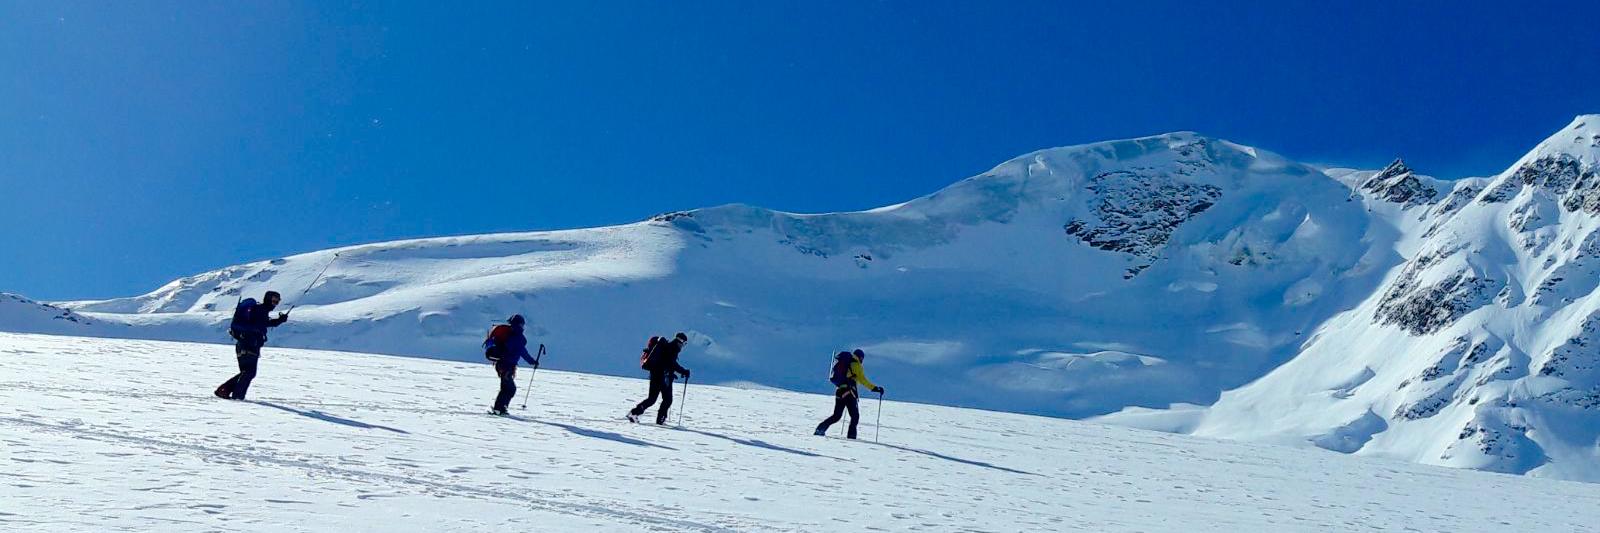 Skitour Venediger, Bergführer Osttirol, Daniel Bergführer, Bergführer Innsbruck